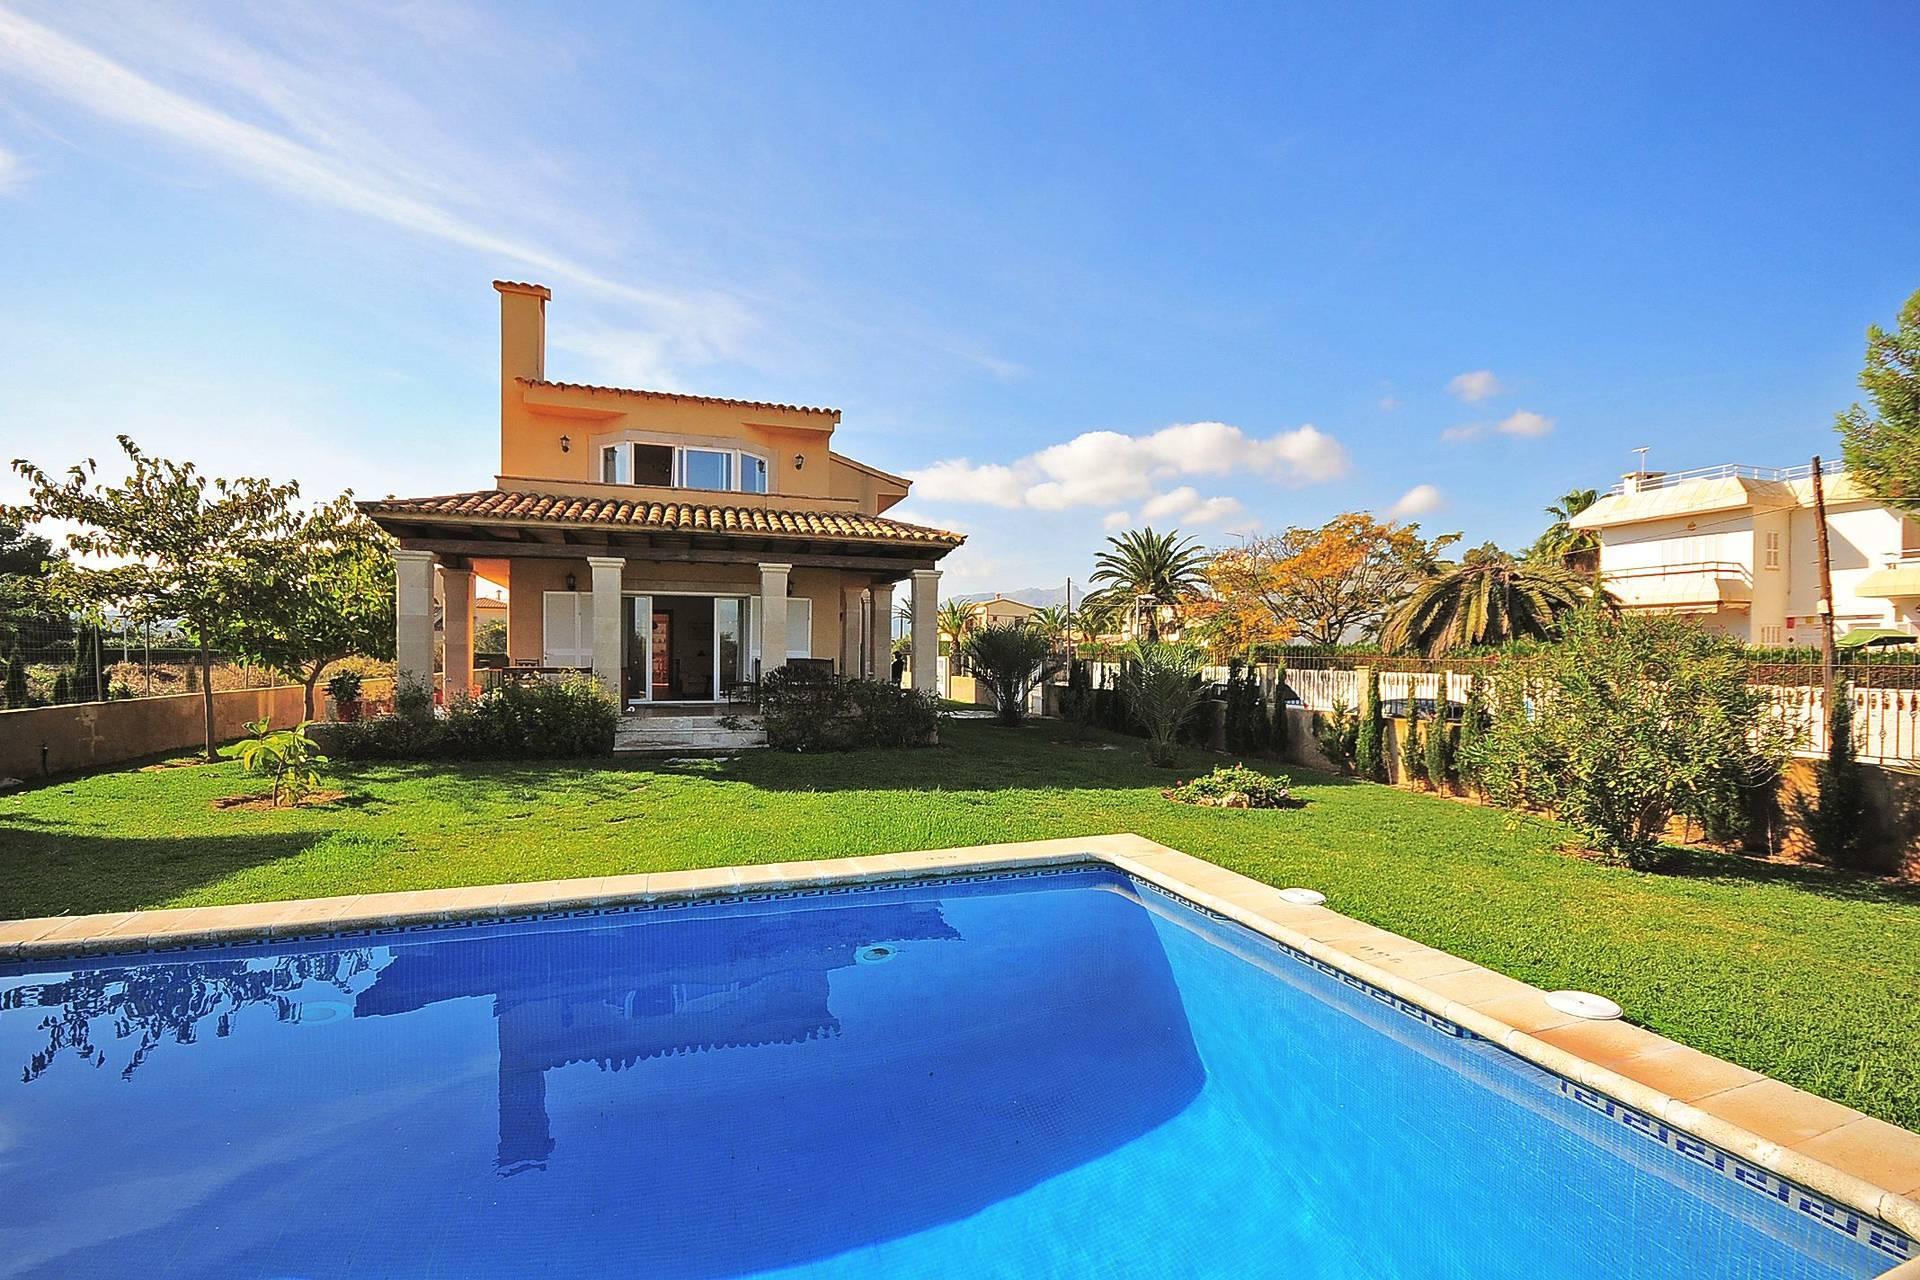 01-233 Ferienhaus am Strand Mallorca Norden Bild 1